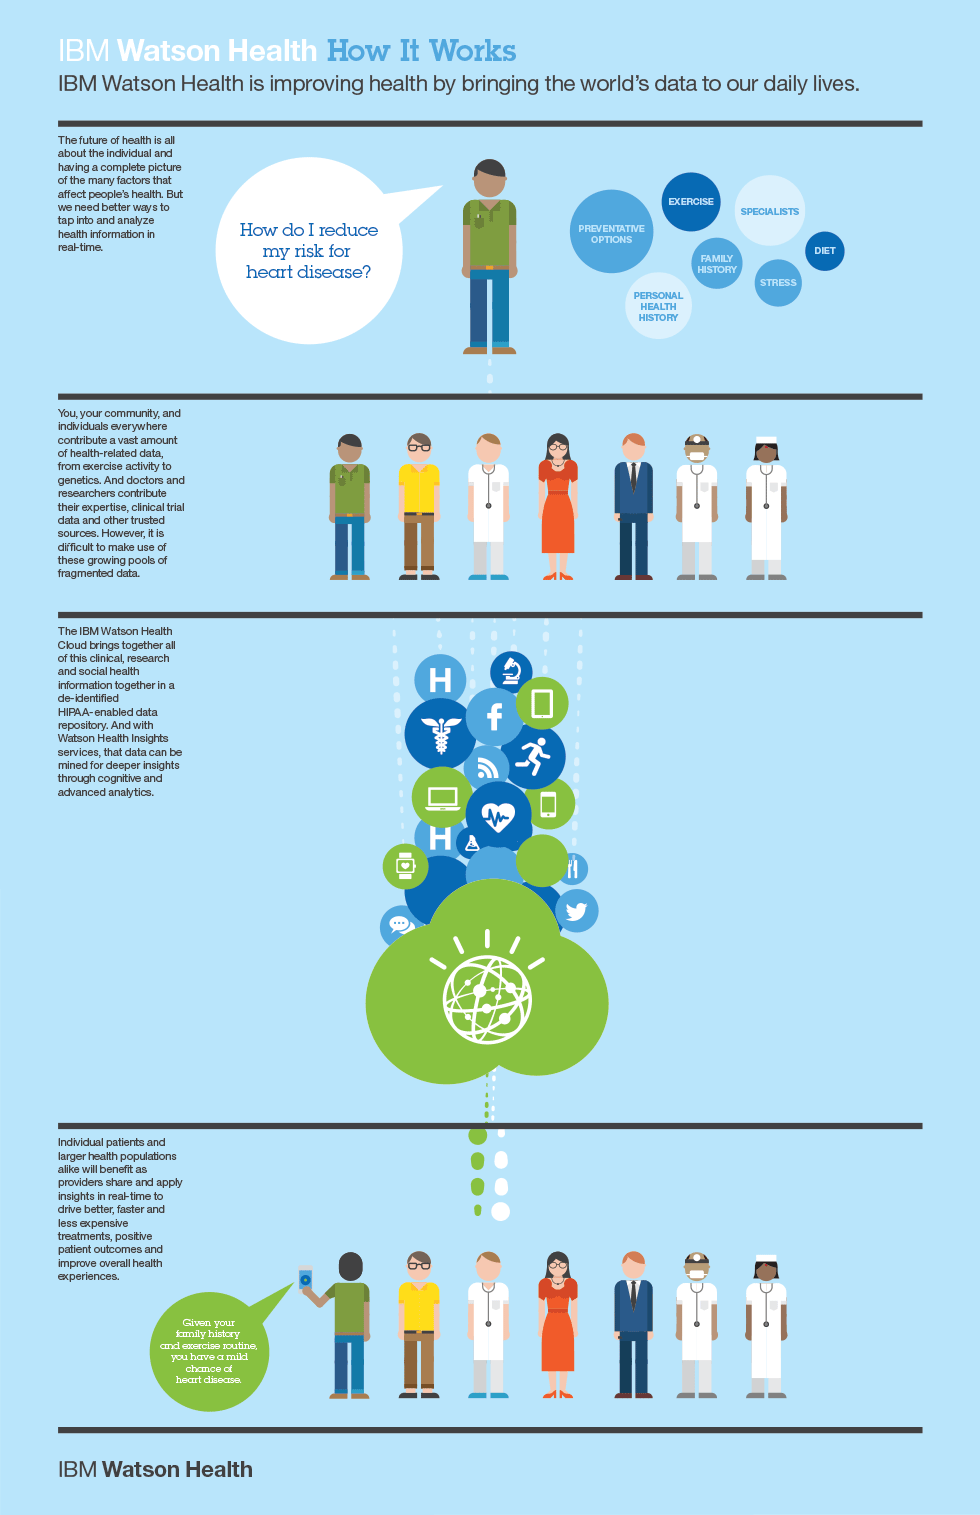 ibm-watson-health-infographic